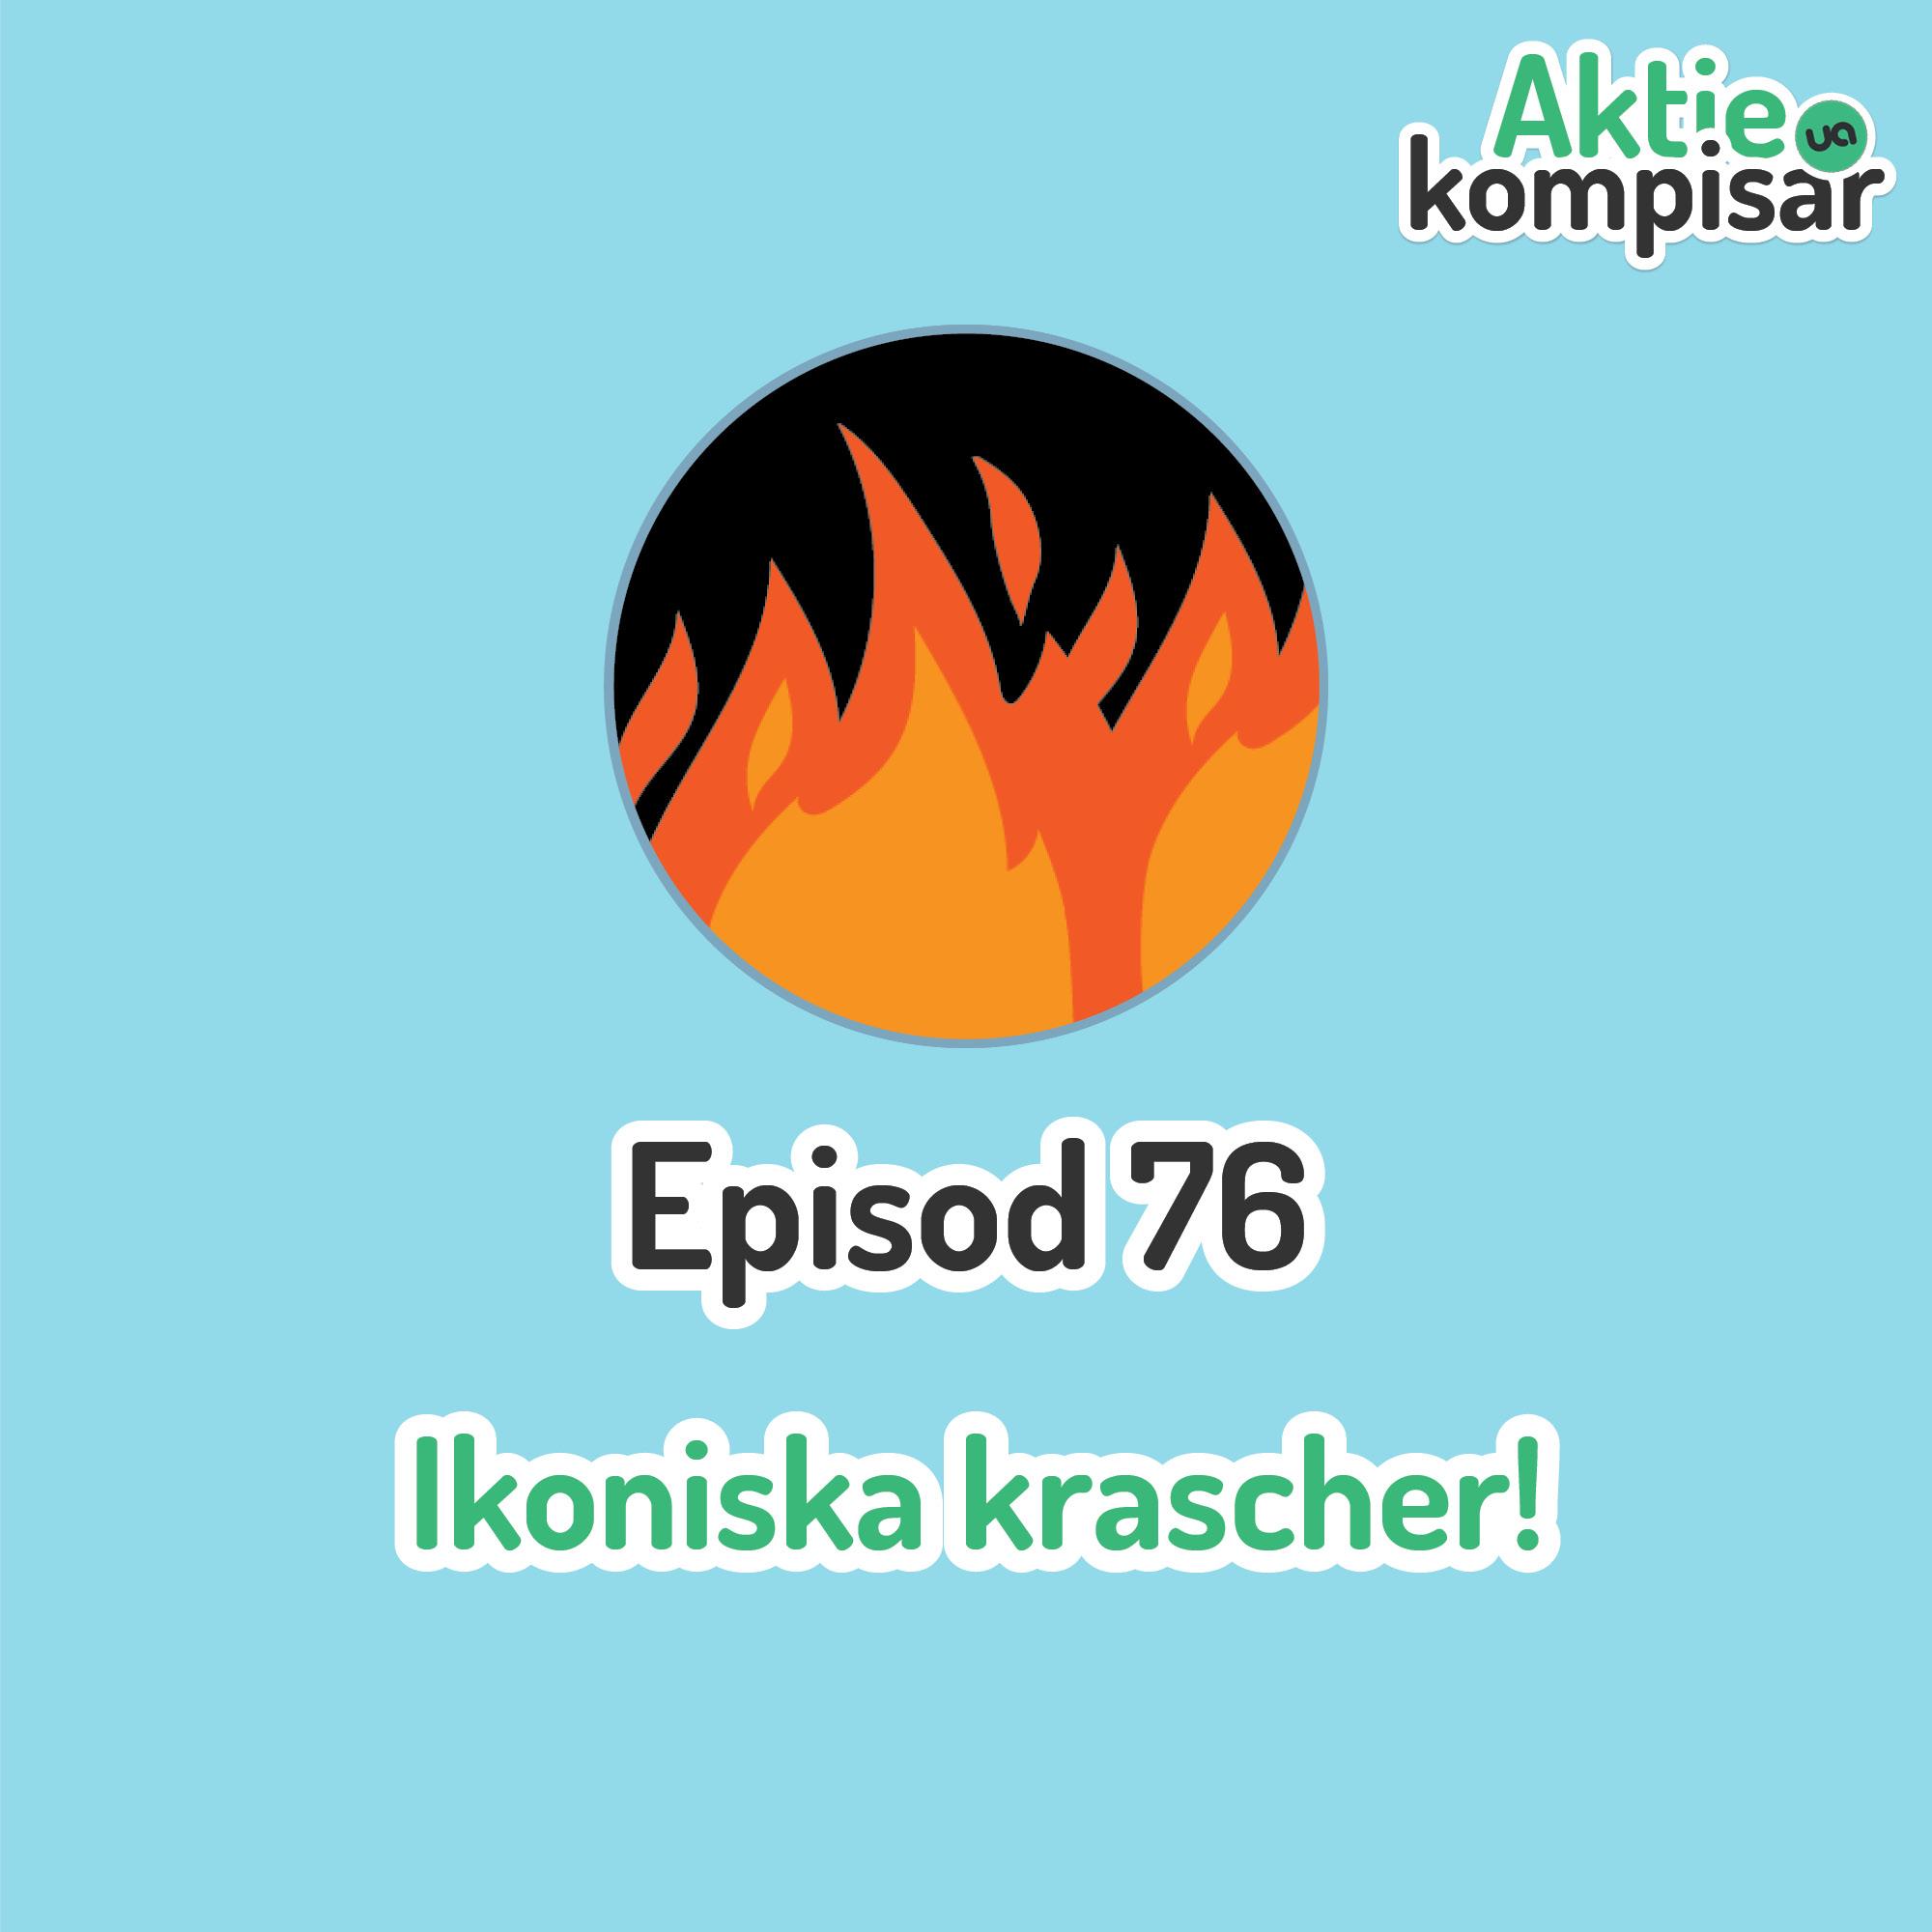 Episod 76 - Ikoniska krascher!